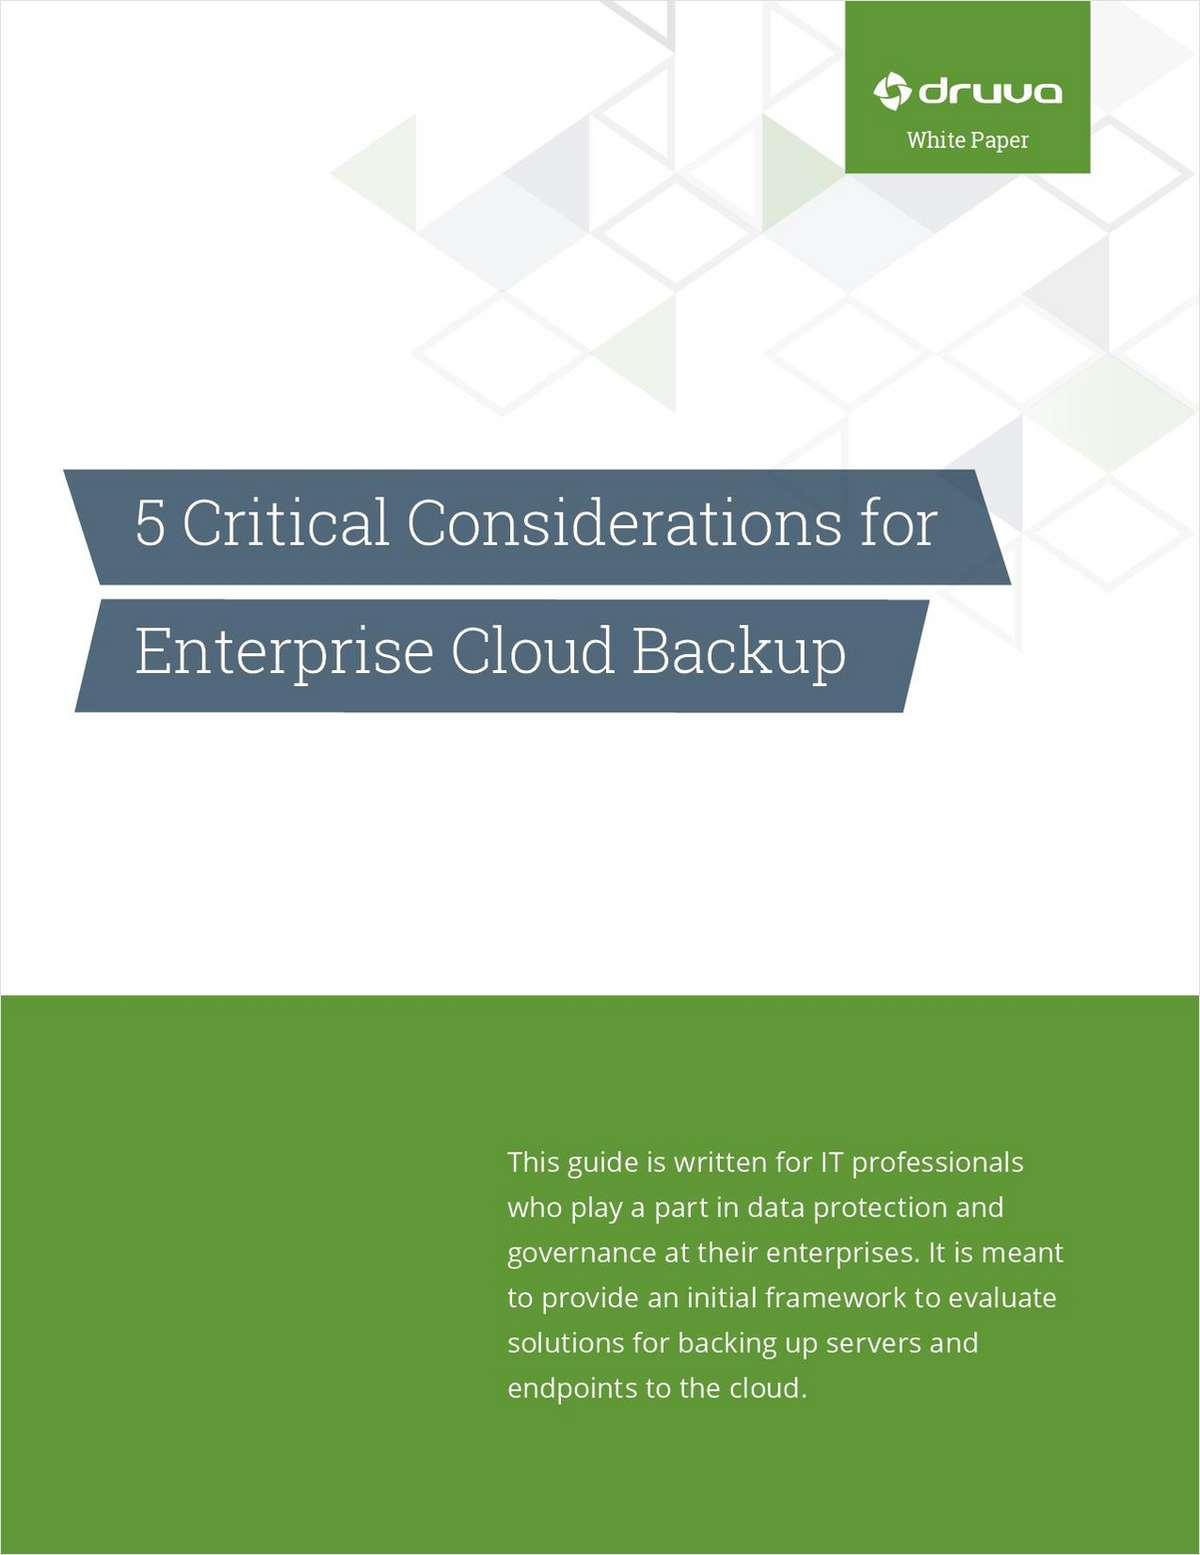 5 Critical Considerations for Enterprise Cloud Backup